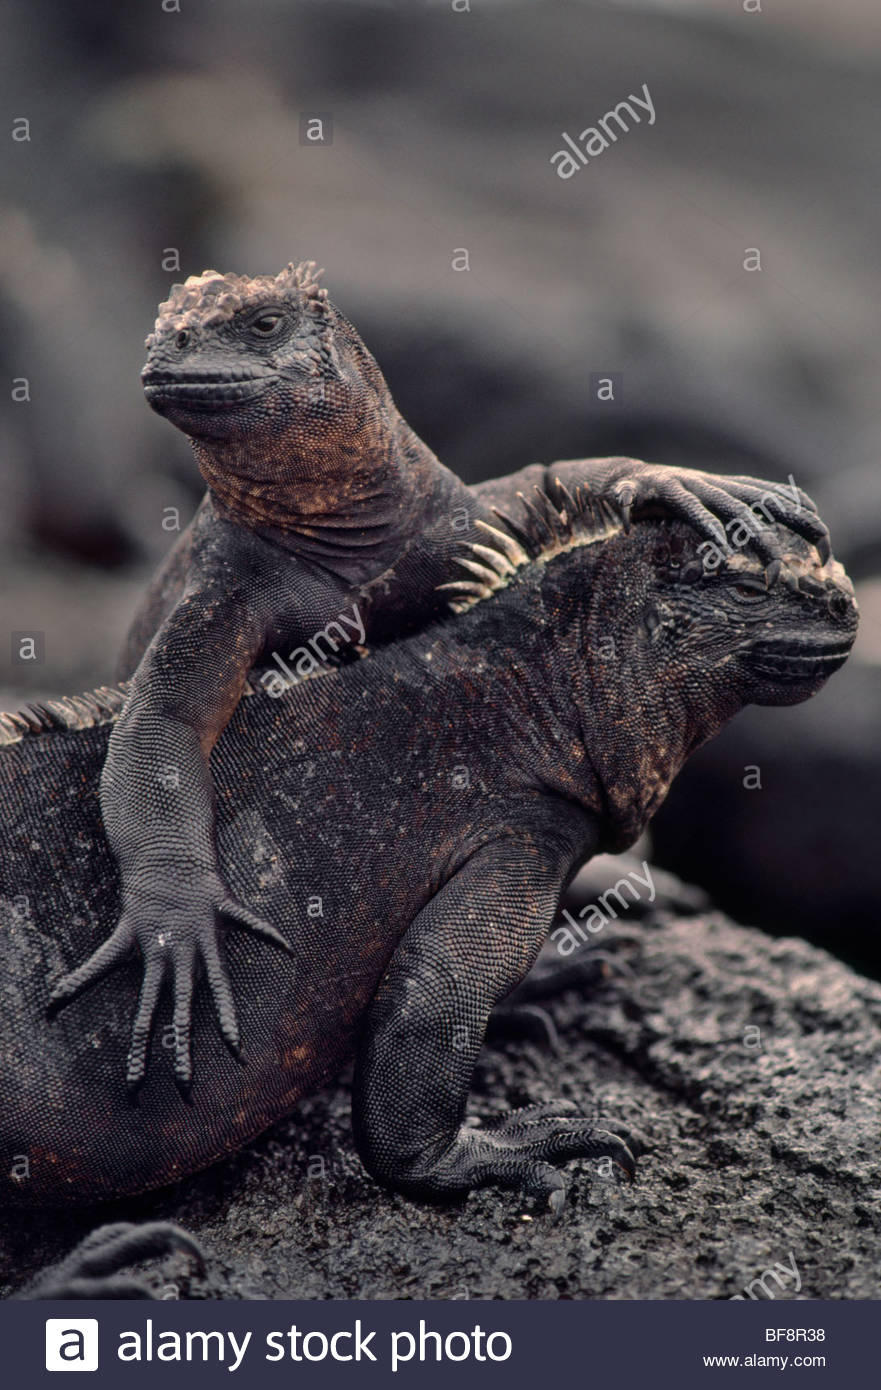 Marine iguana pair, Amblyrhynchus cristatus, Galapagos Islands - Stock Image